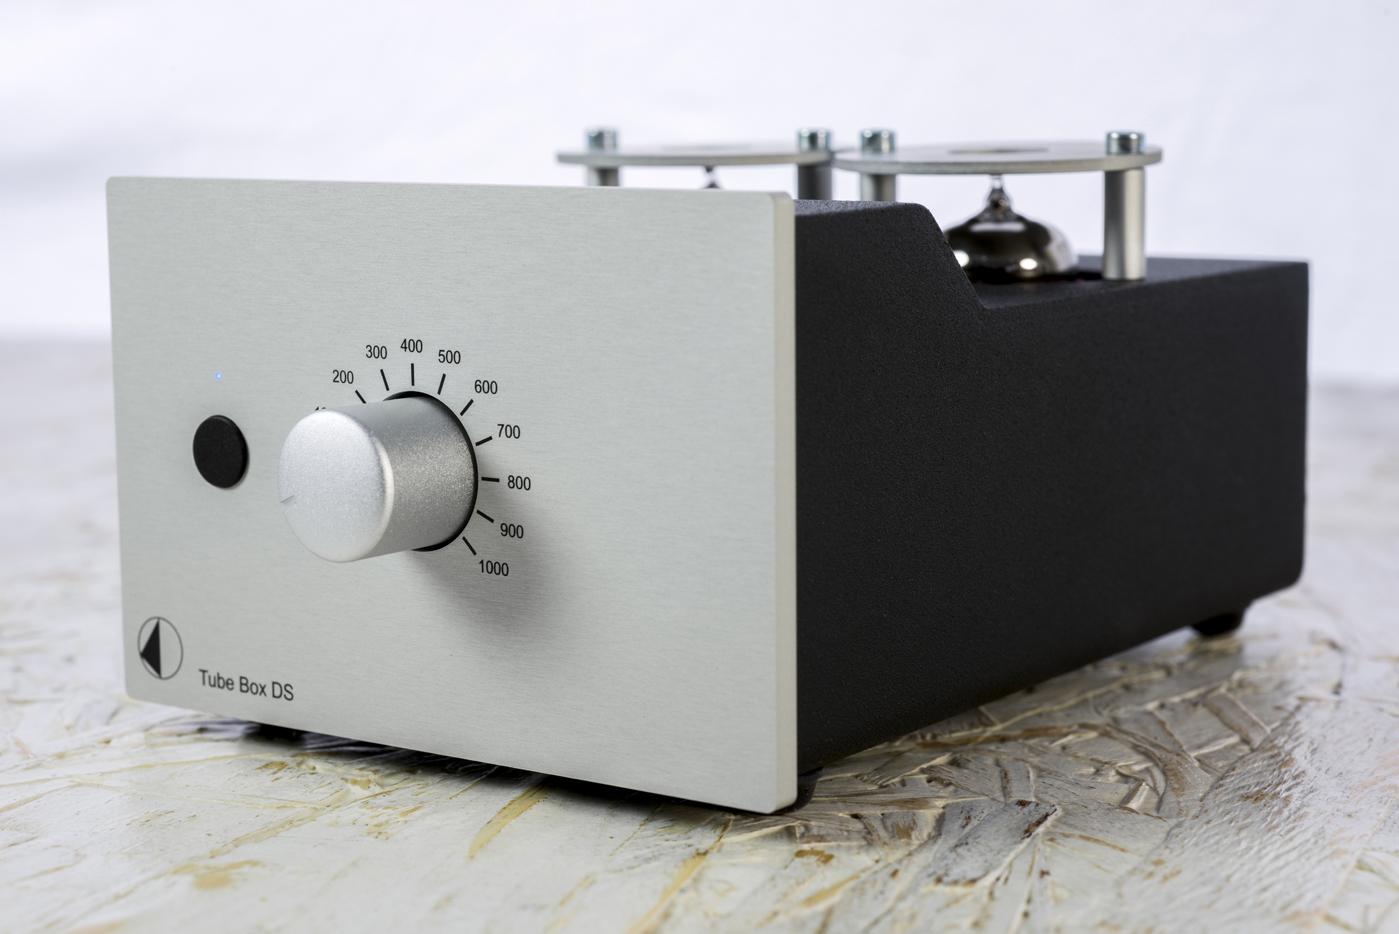 pro-ject-phono-box-ds-001.jpg